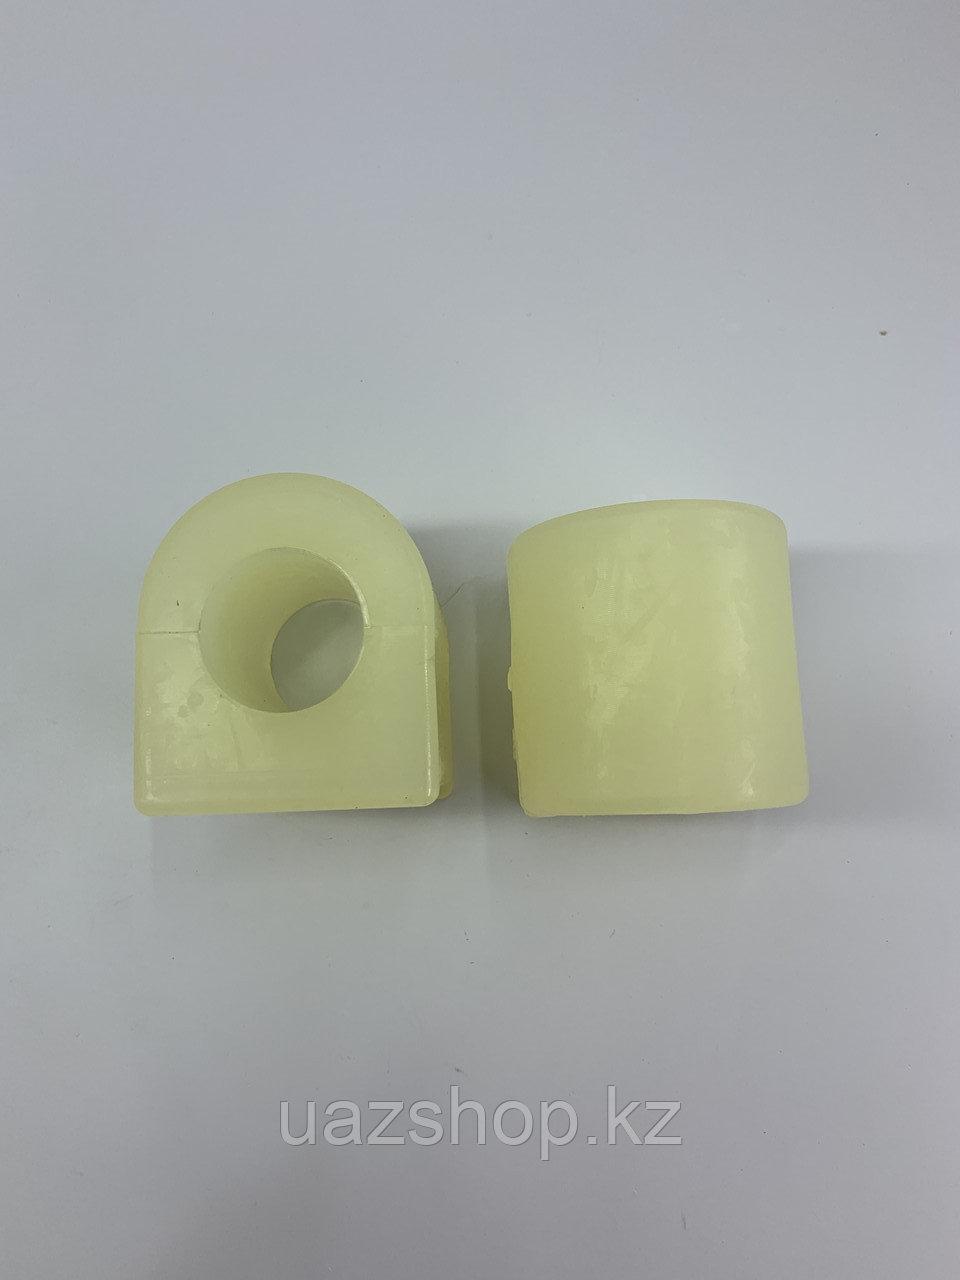 Втулка переднего стабилизатора центральная 24 мм (полиуретан) Для УАЗ Хантер